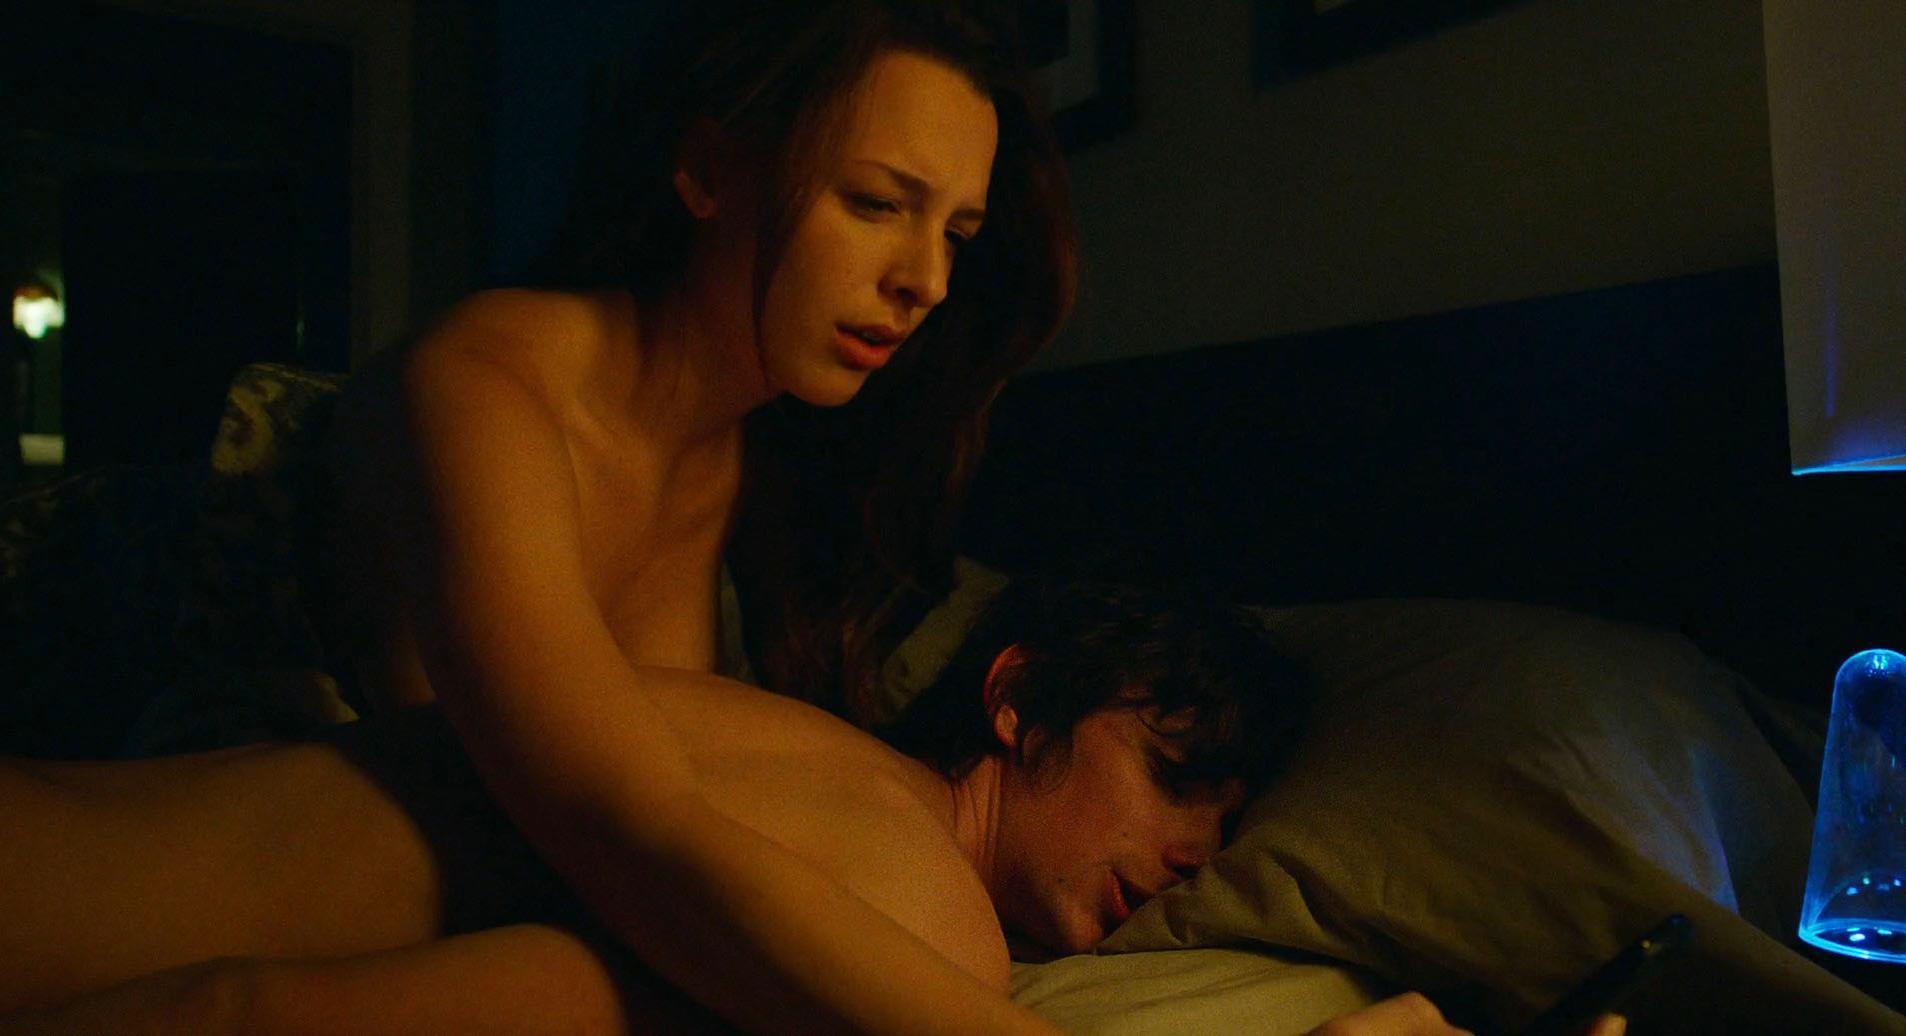 Aubrey Reynolds nude - Being Charlie (2016)